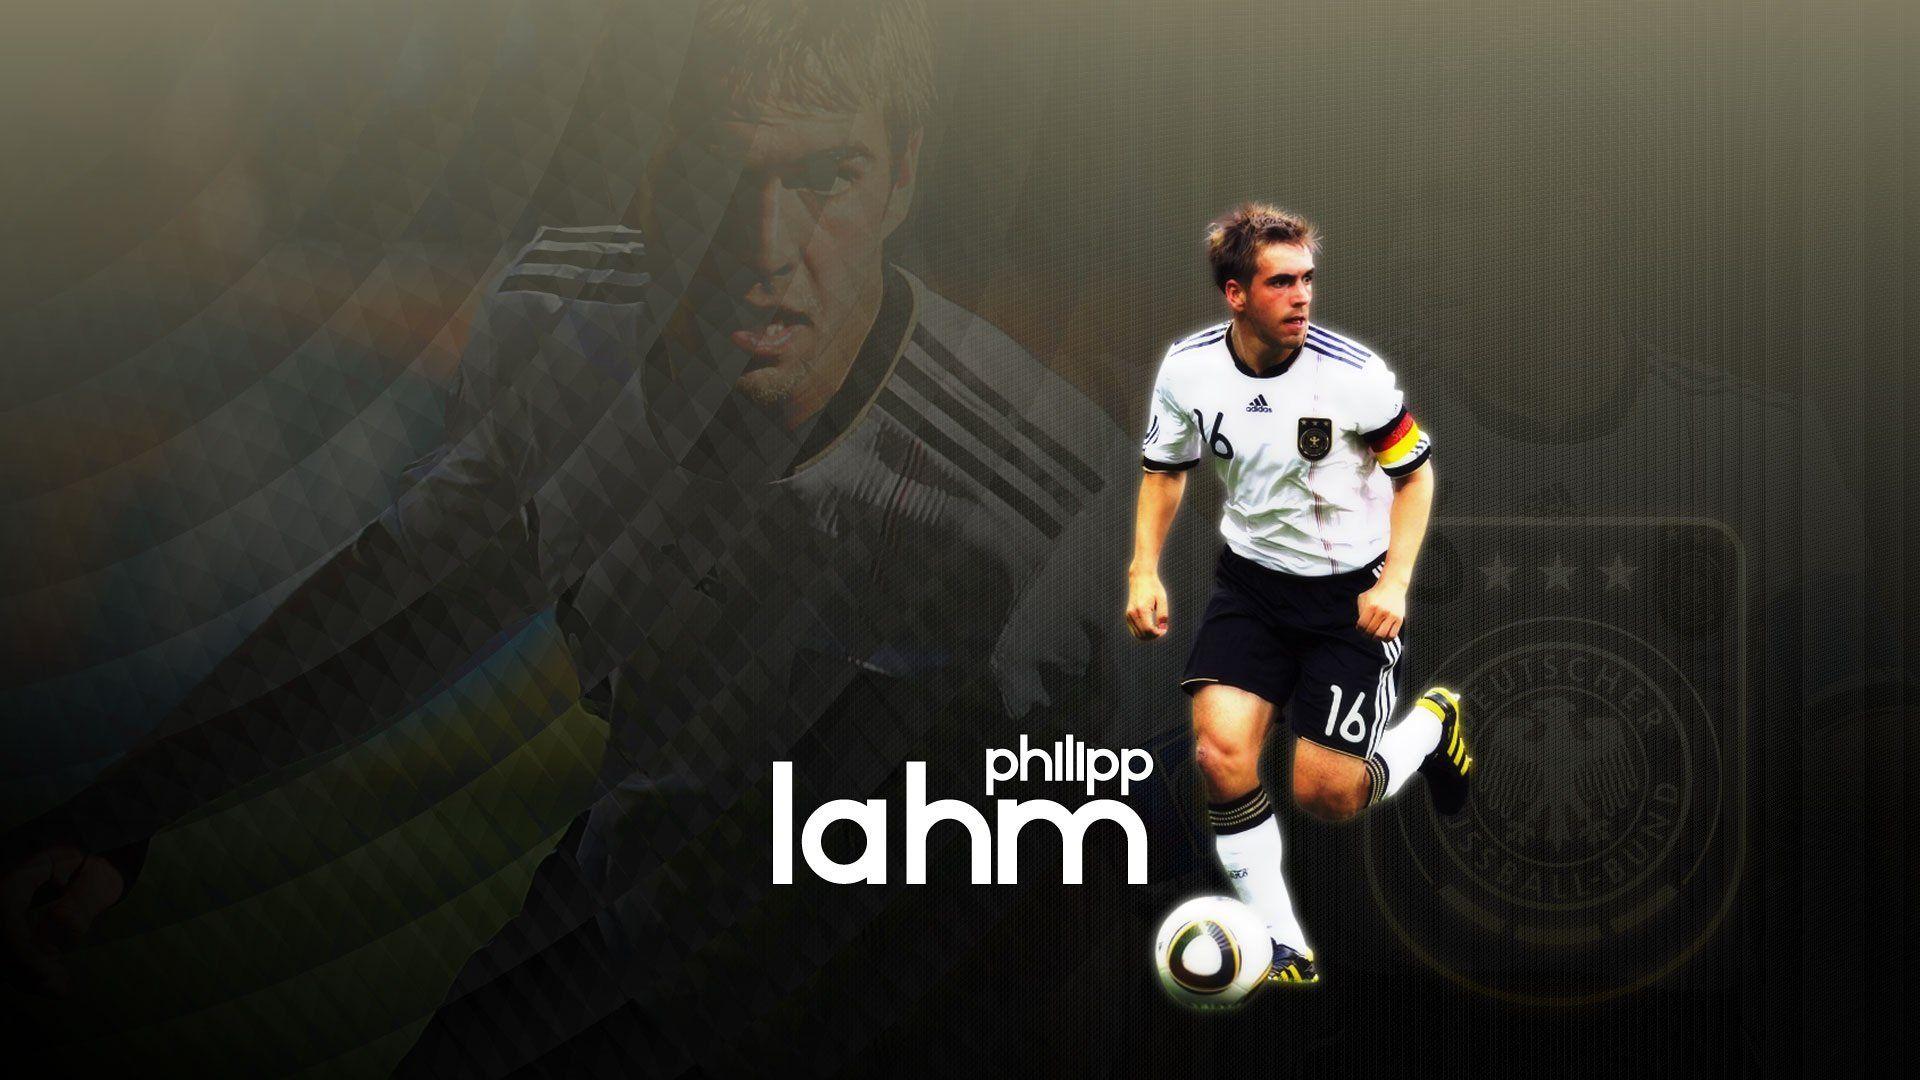 Philipp Lahm Wallpaper 13 Philipp Lahm Wallpaper